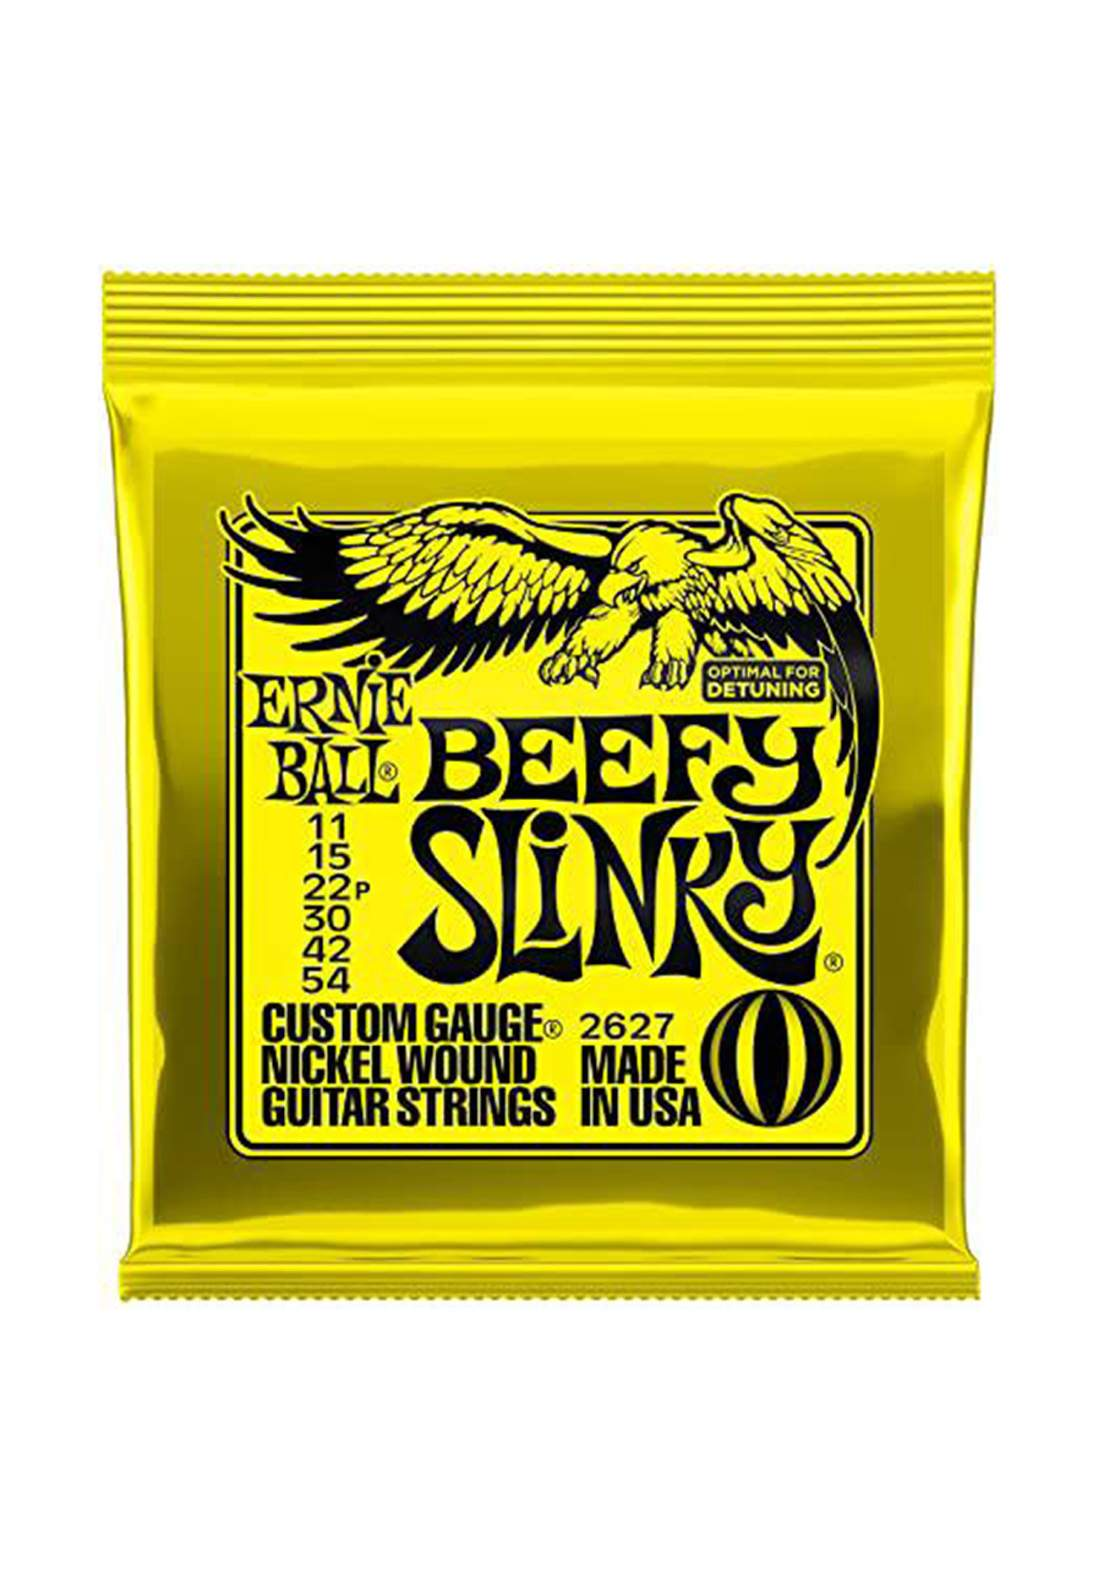 Electric Guitar Ernie Ball Strings 2627 Beefy Slinky - اوتار جيتار